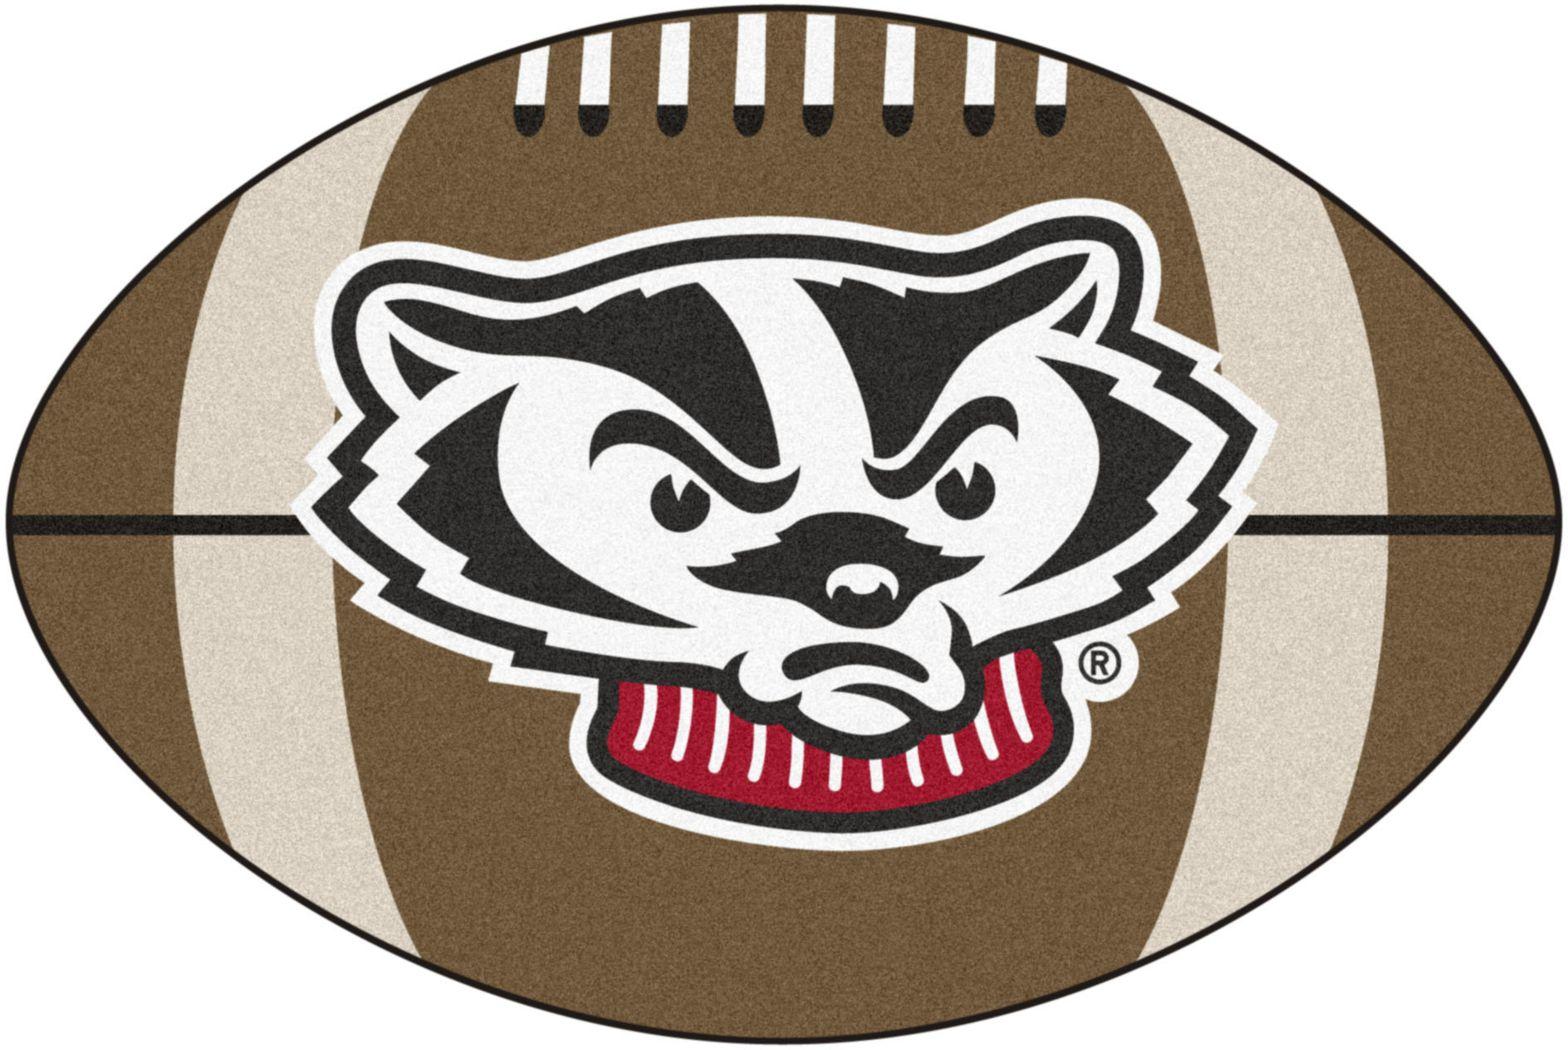 "NCAA Football Mascot University of Wisconsin 1'6"" x 1'10"" Rug"